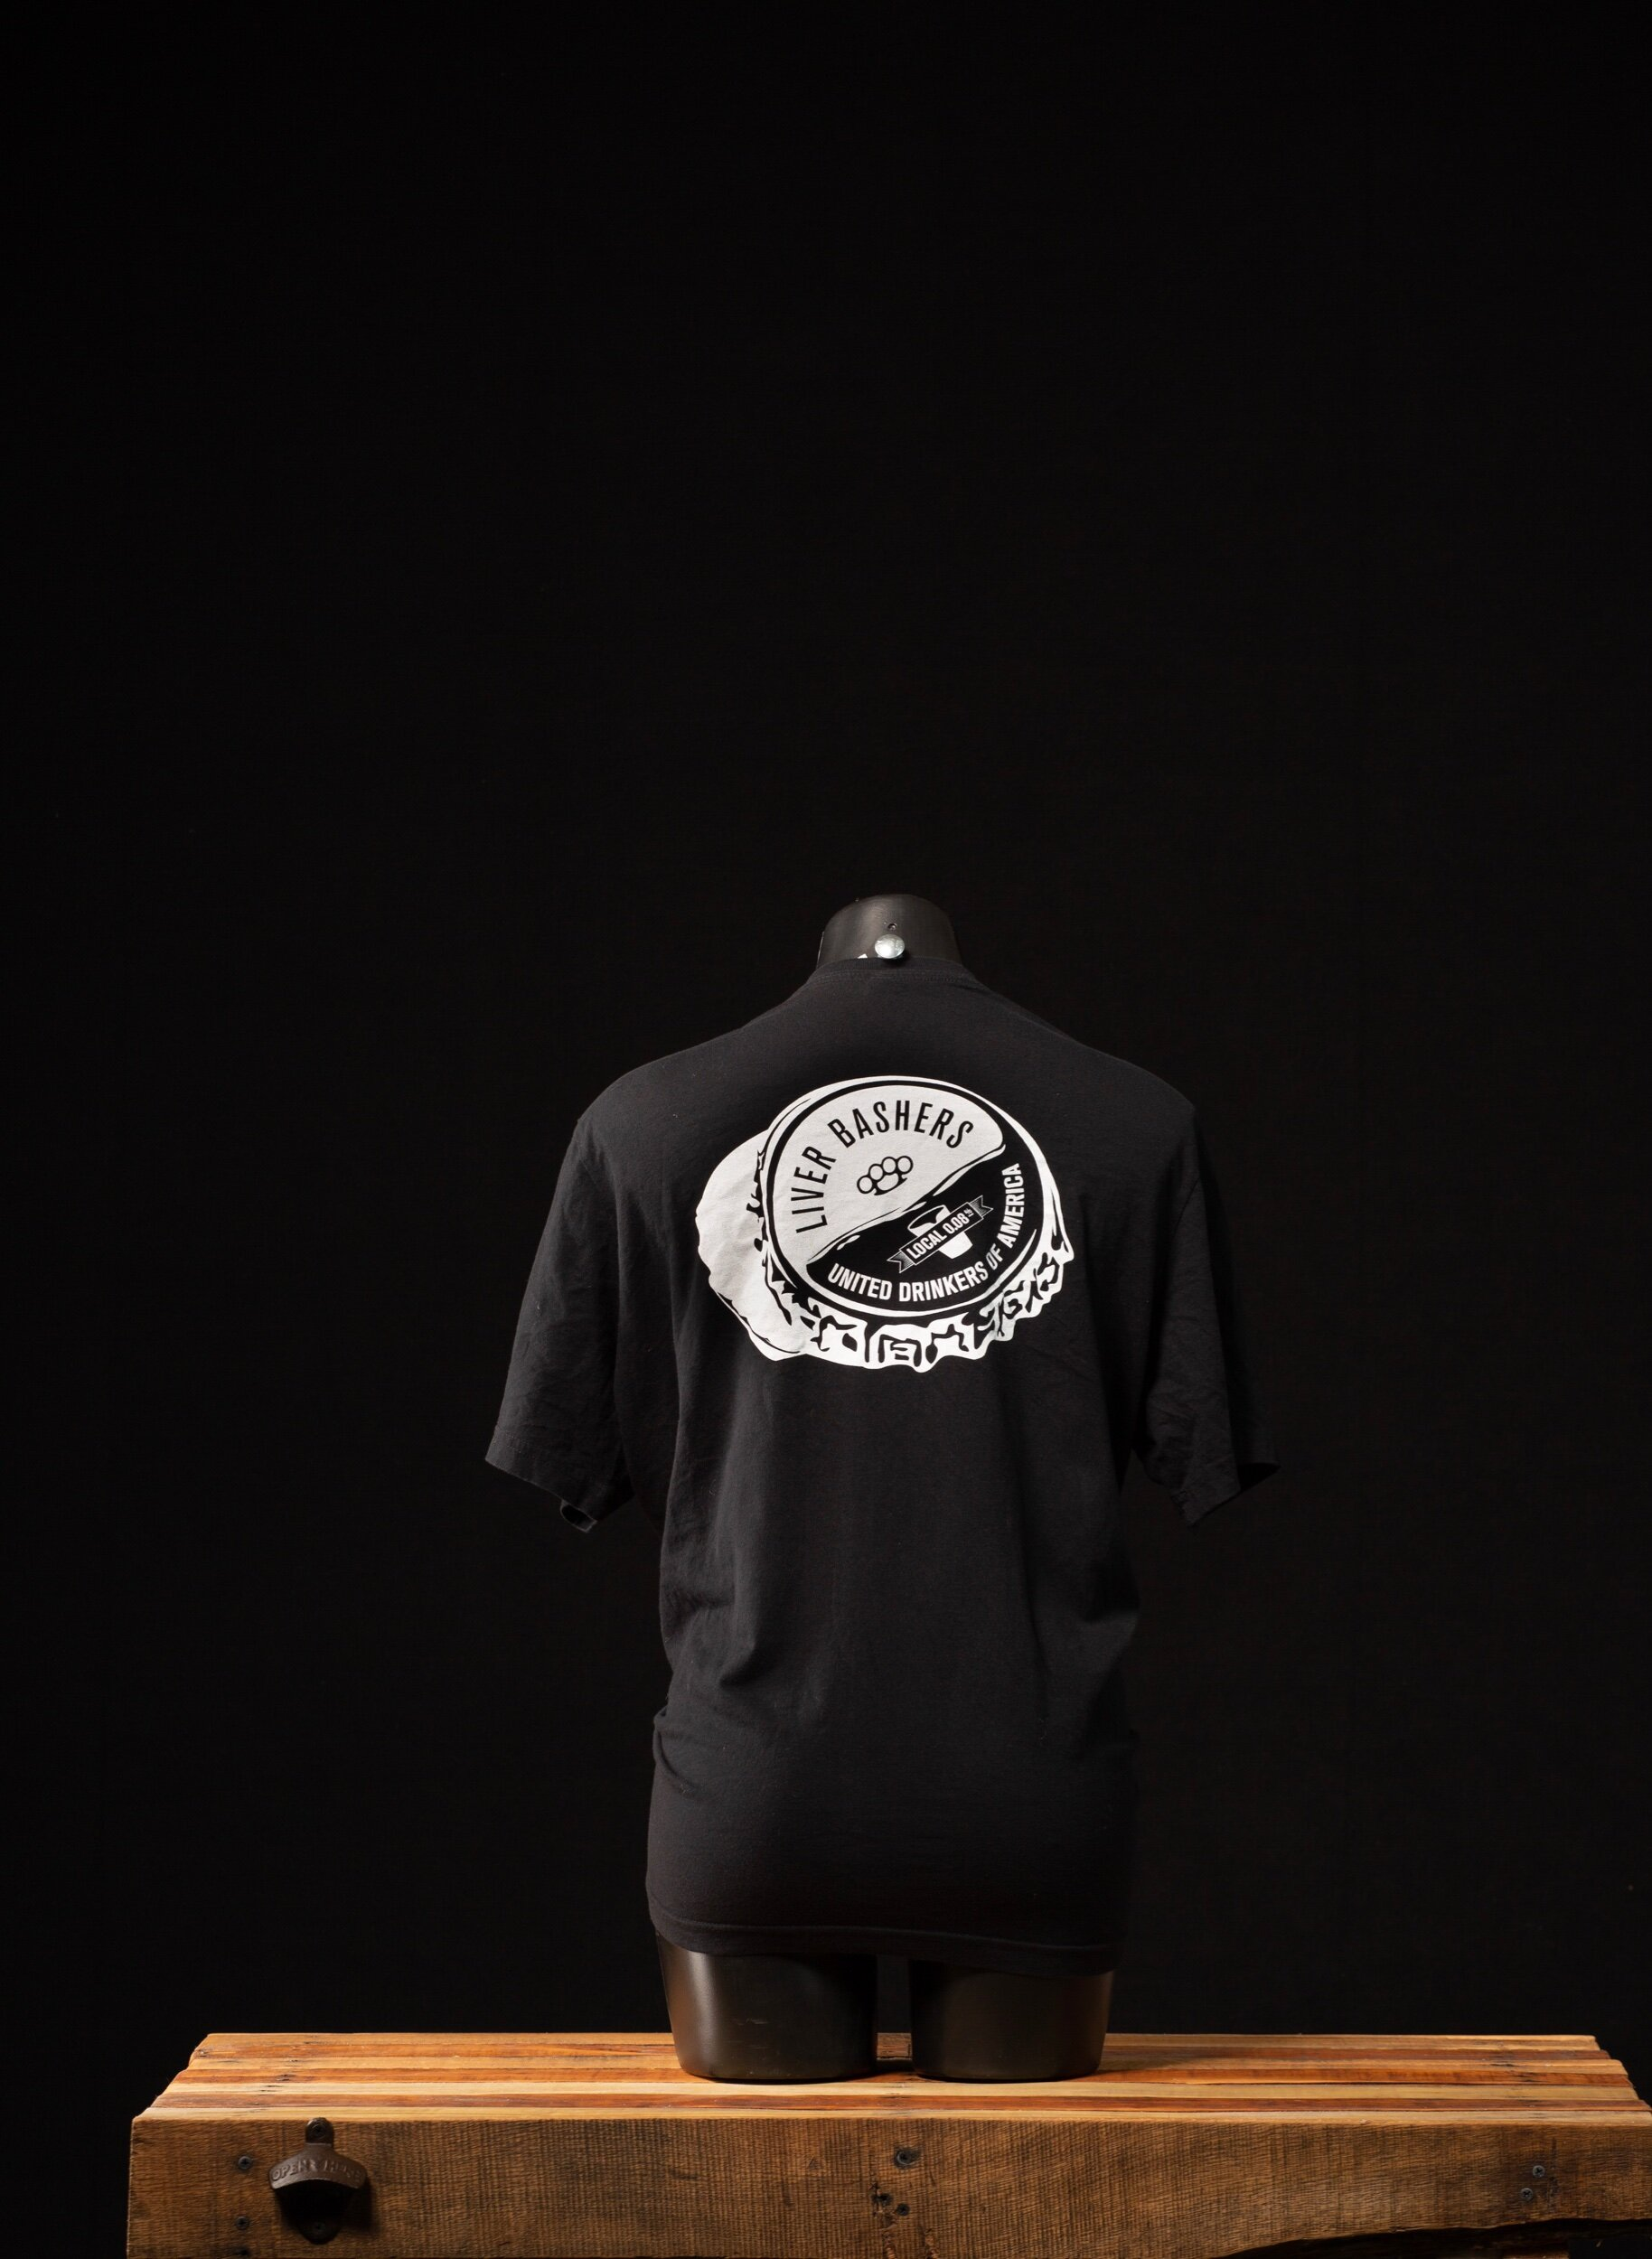 Liverbasher_Shirt-290.jpeg